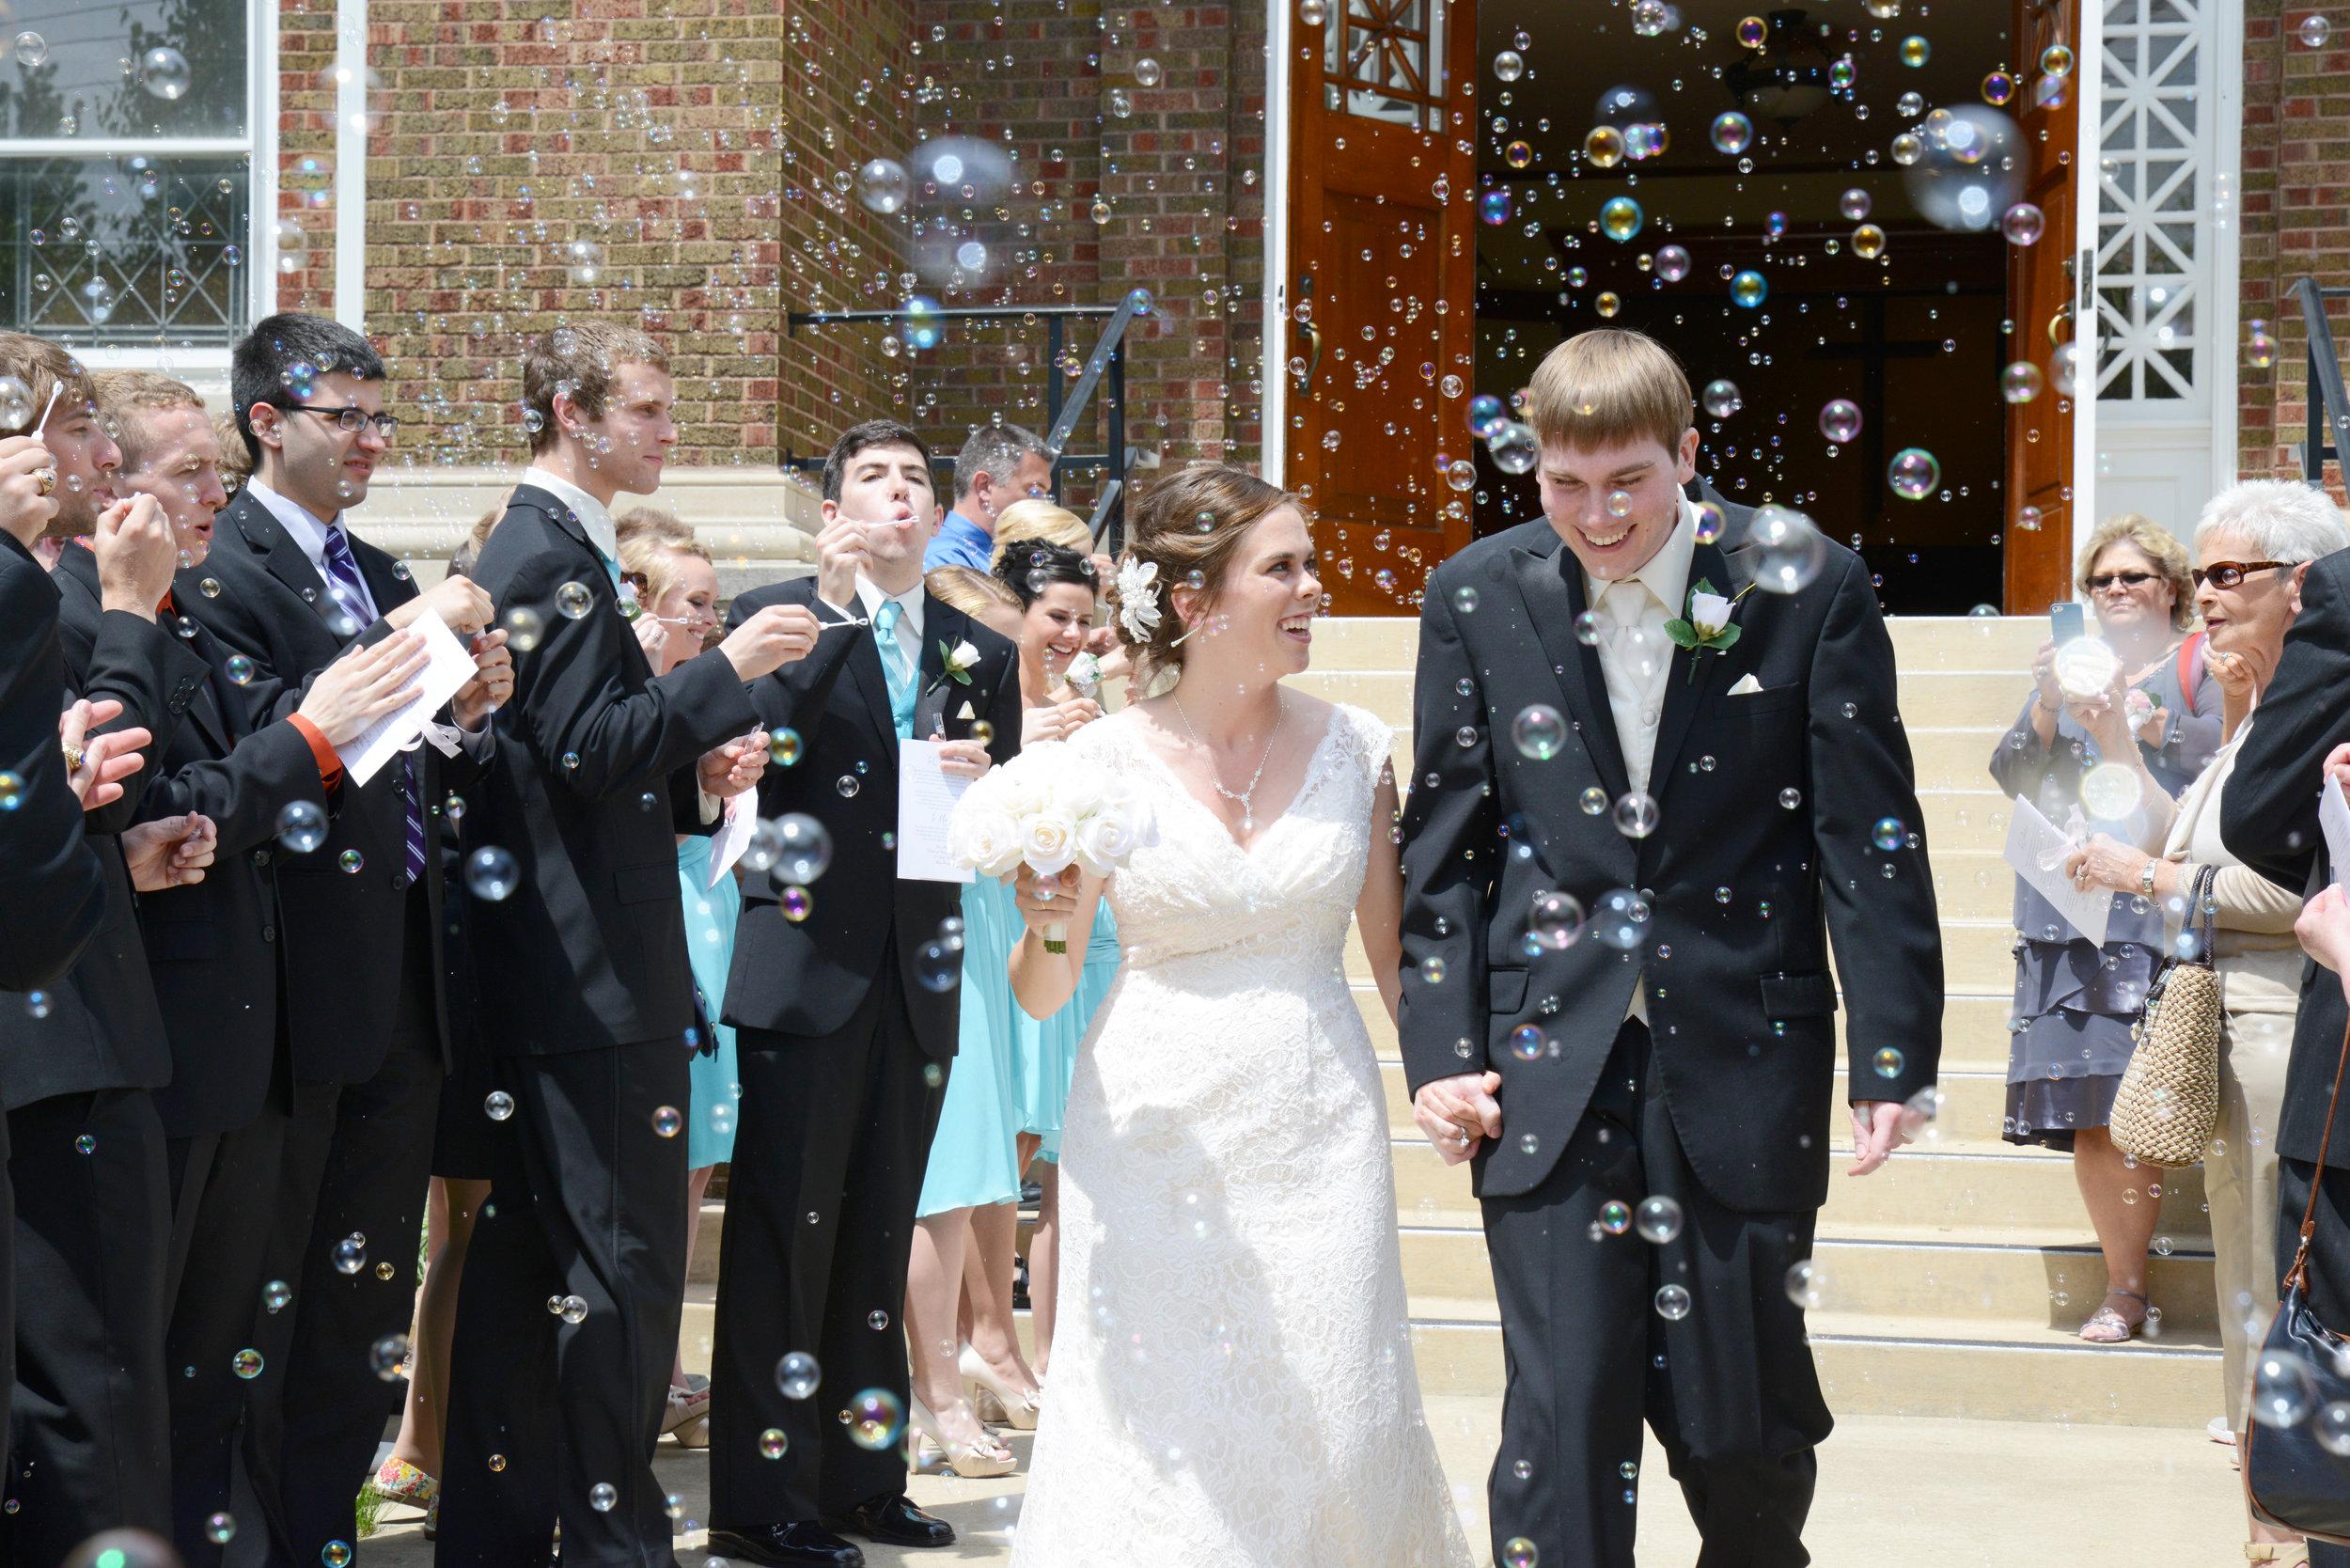 May 24, 2014: Johnie and Evan got married!